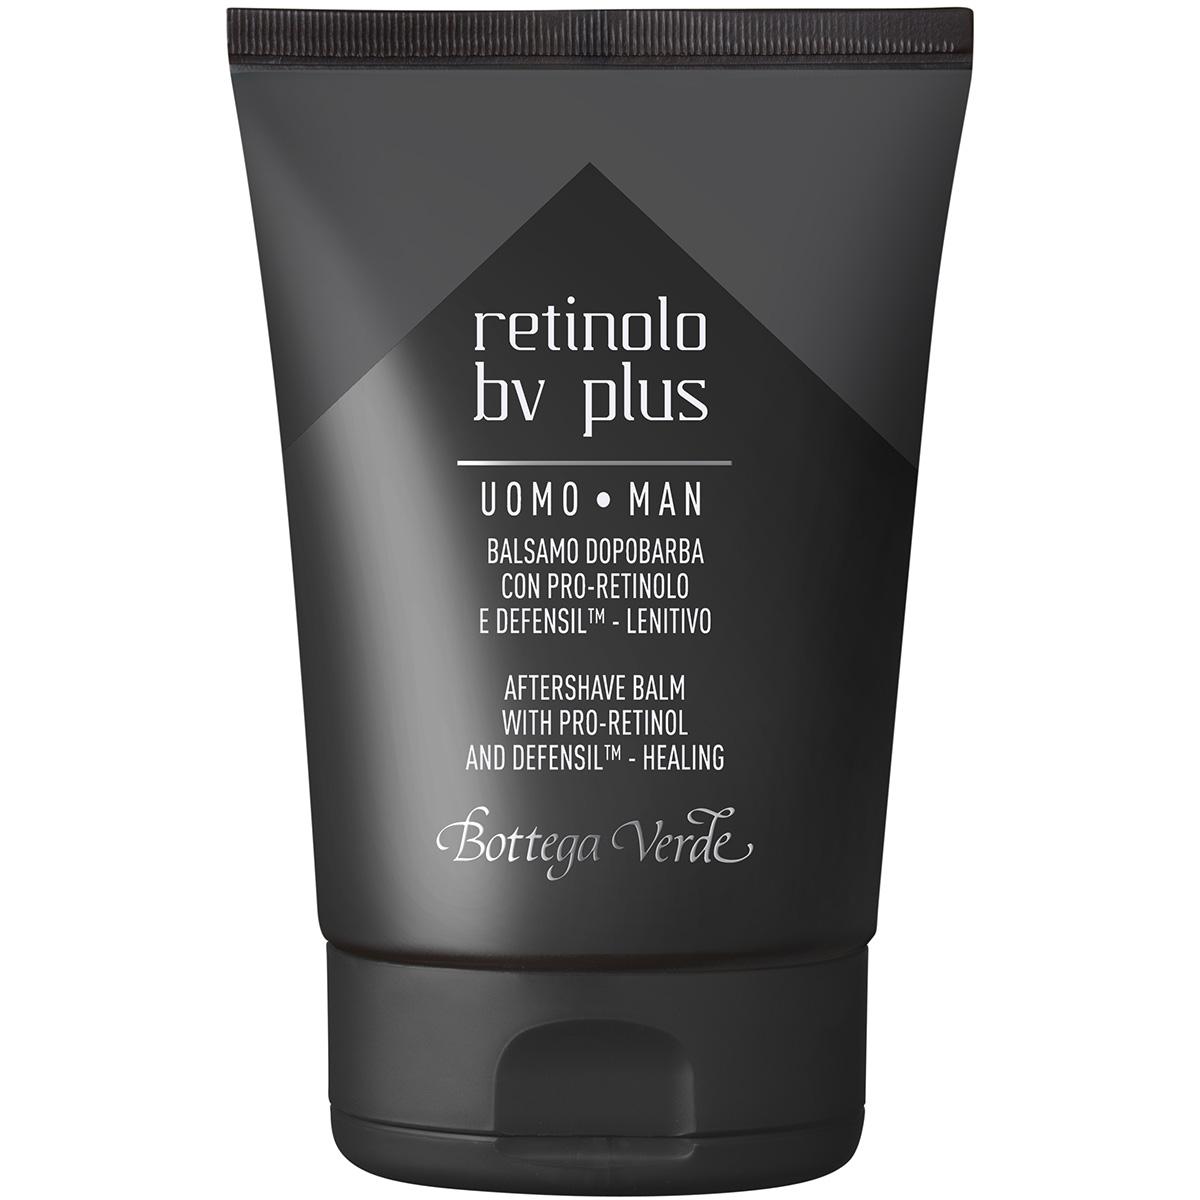 Retinolo Bv Plus Uomo - Balsam Dupa Barbierit  Cu Pro-retinolo Si Defensil (tm) - Calmant